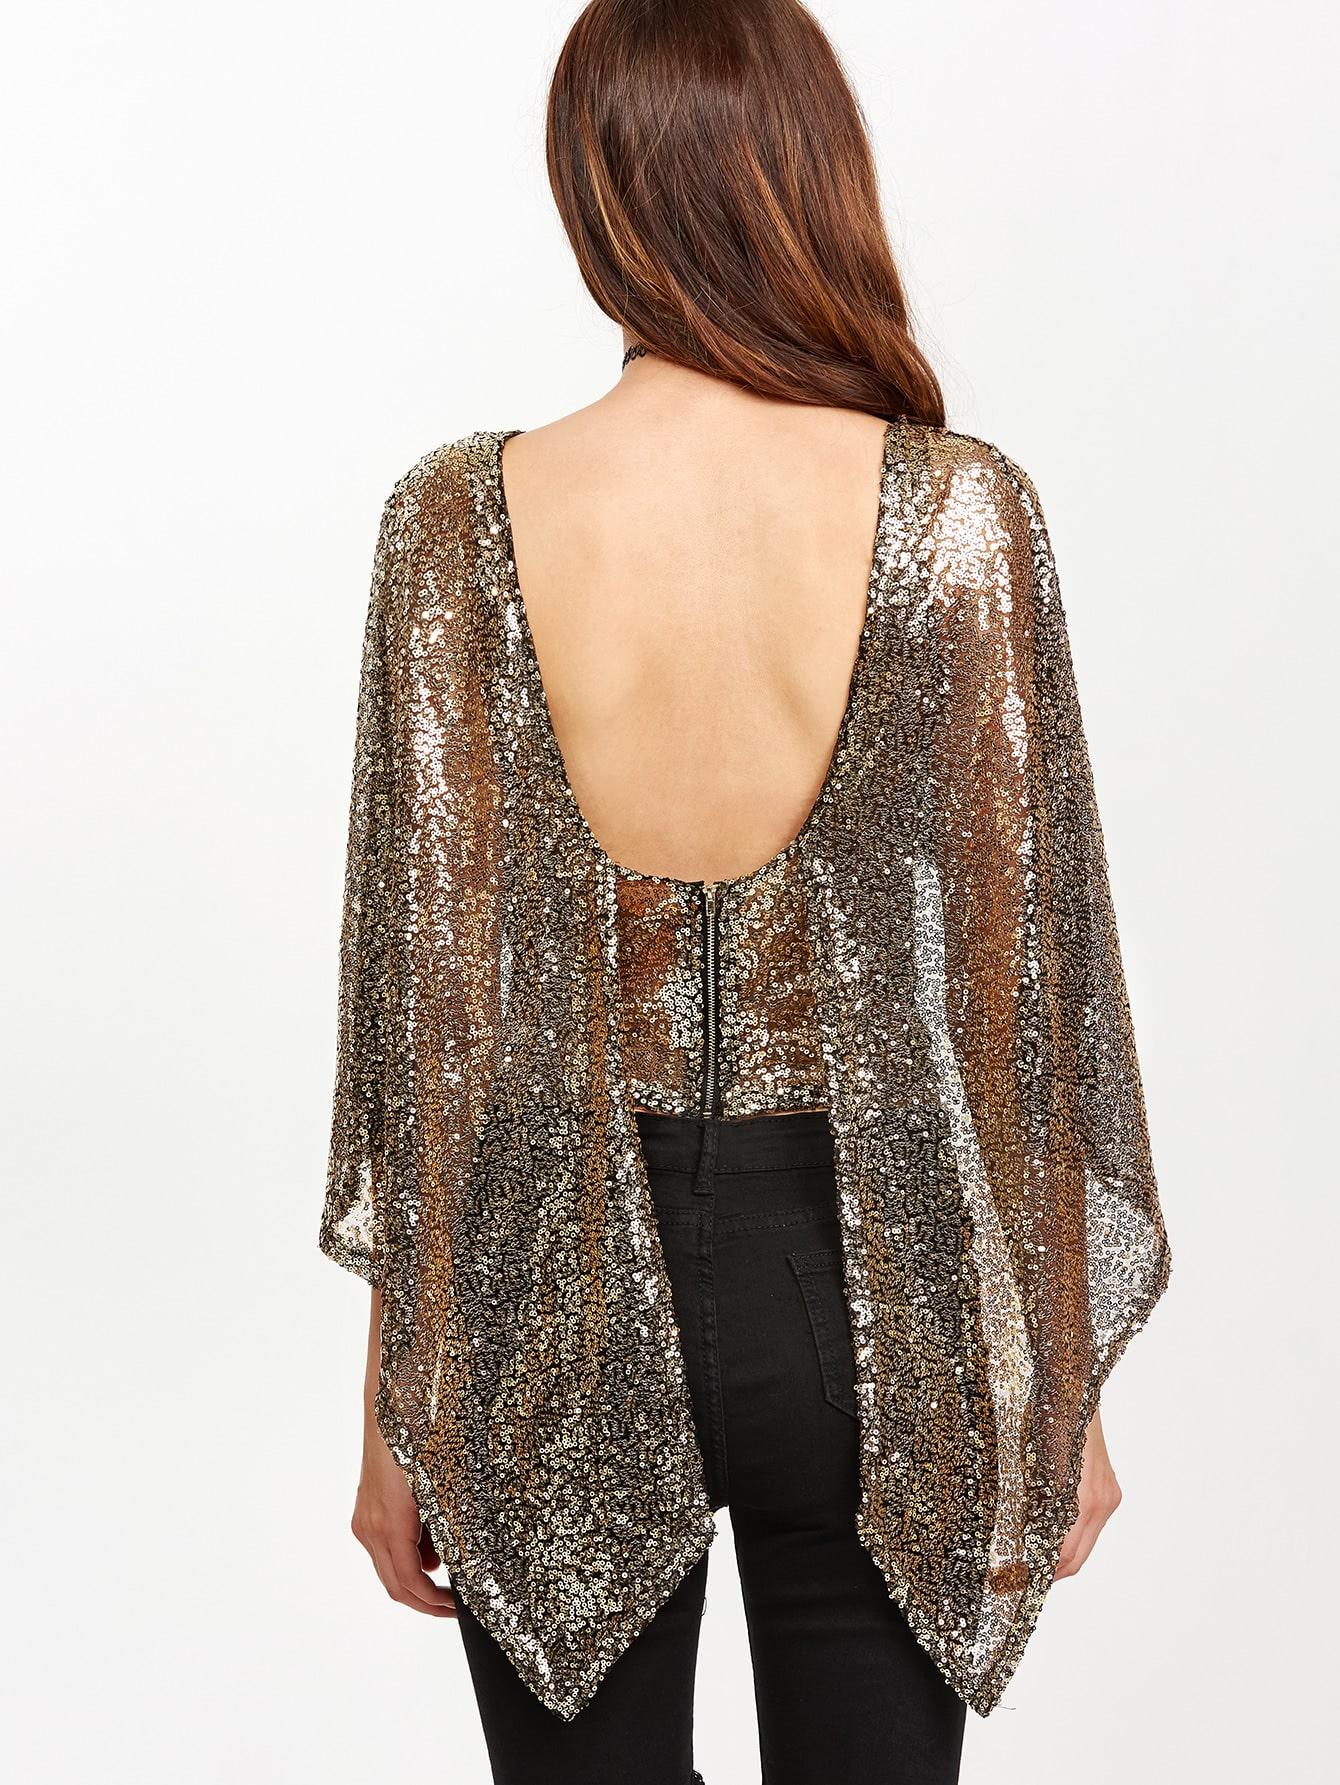 blouse161122321_2